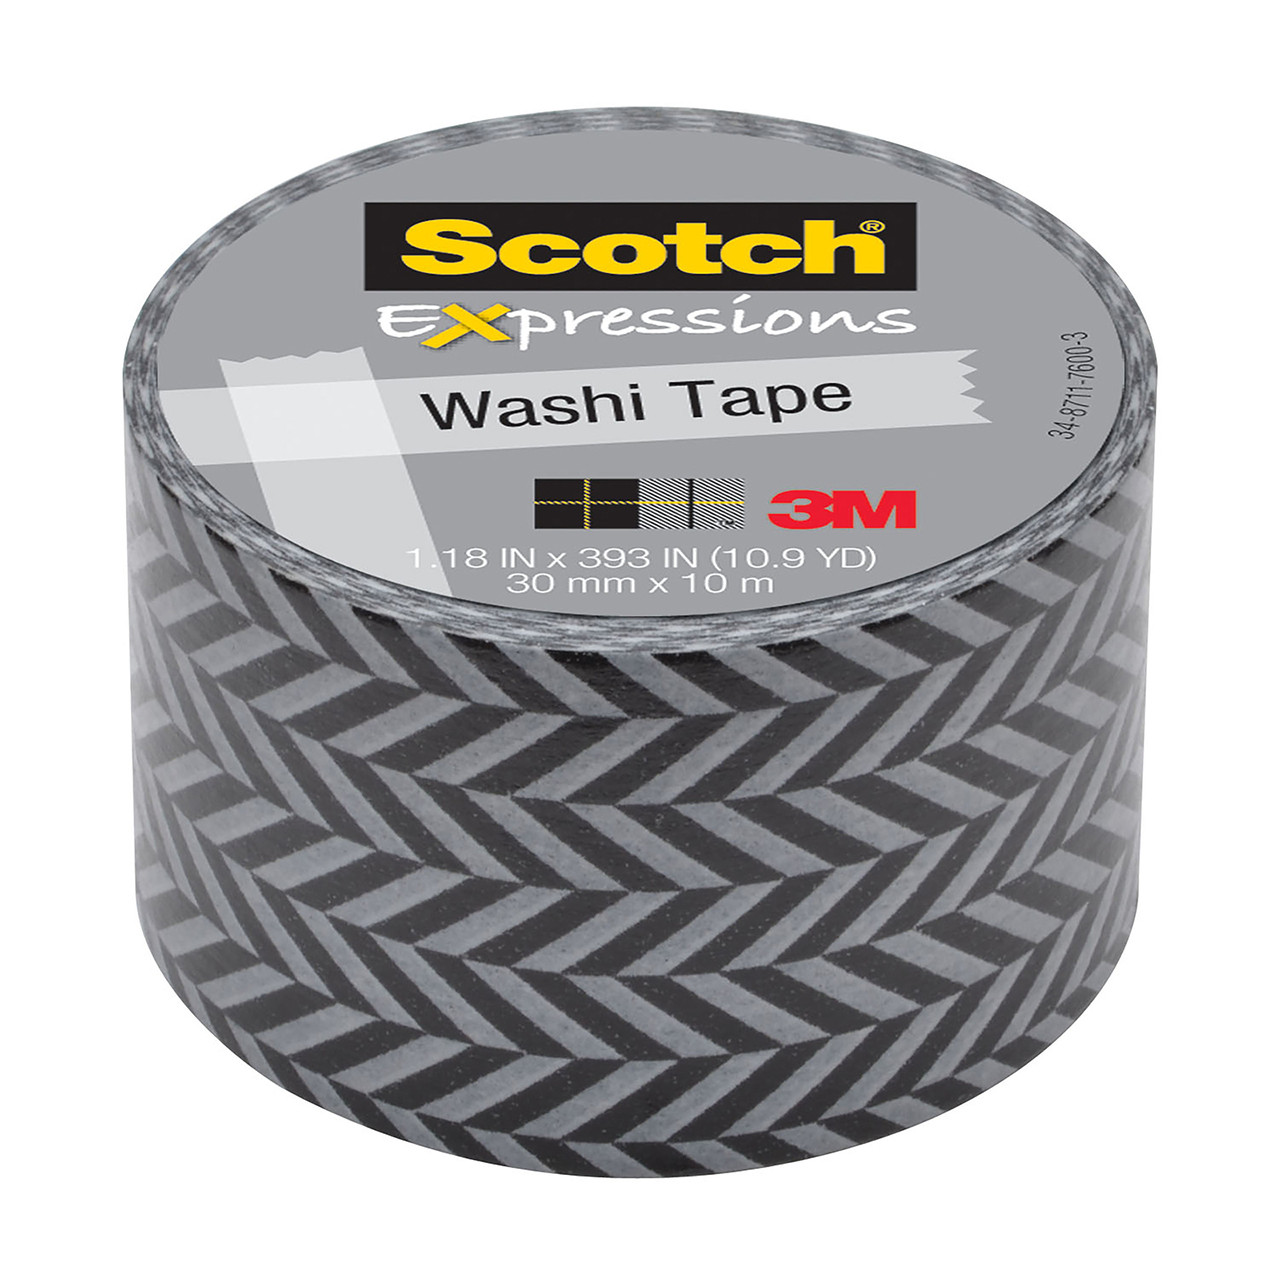 Washi Tape Zigzag 1.18inx393in